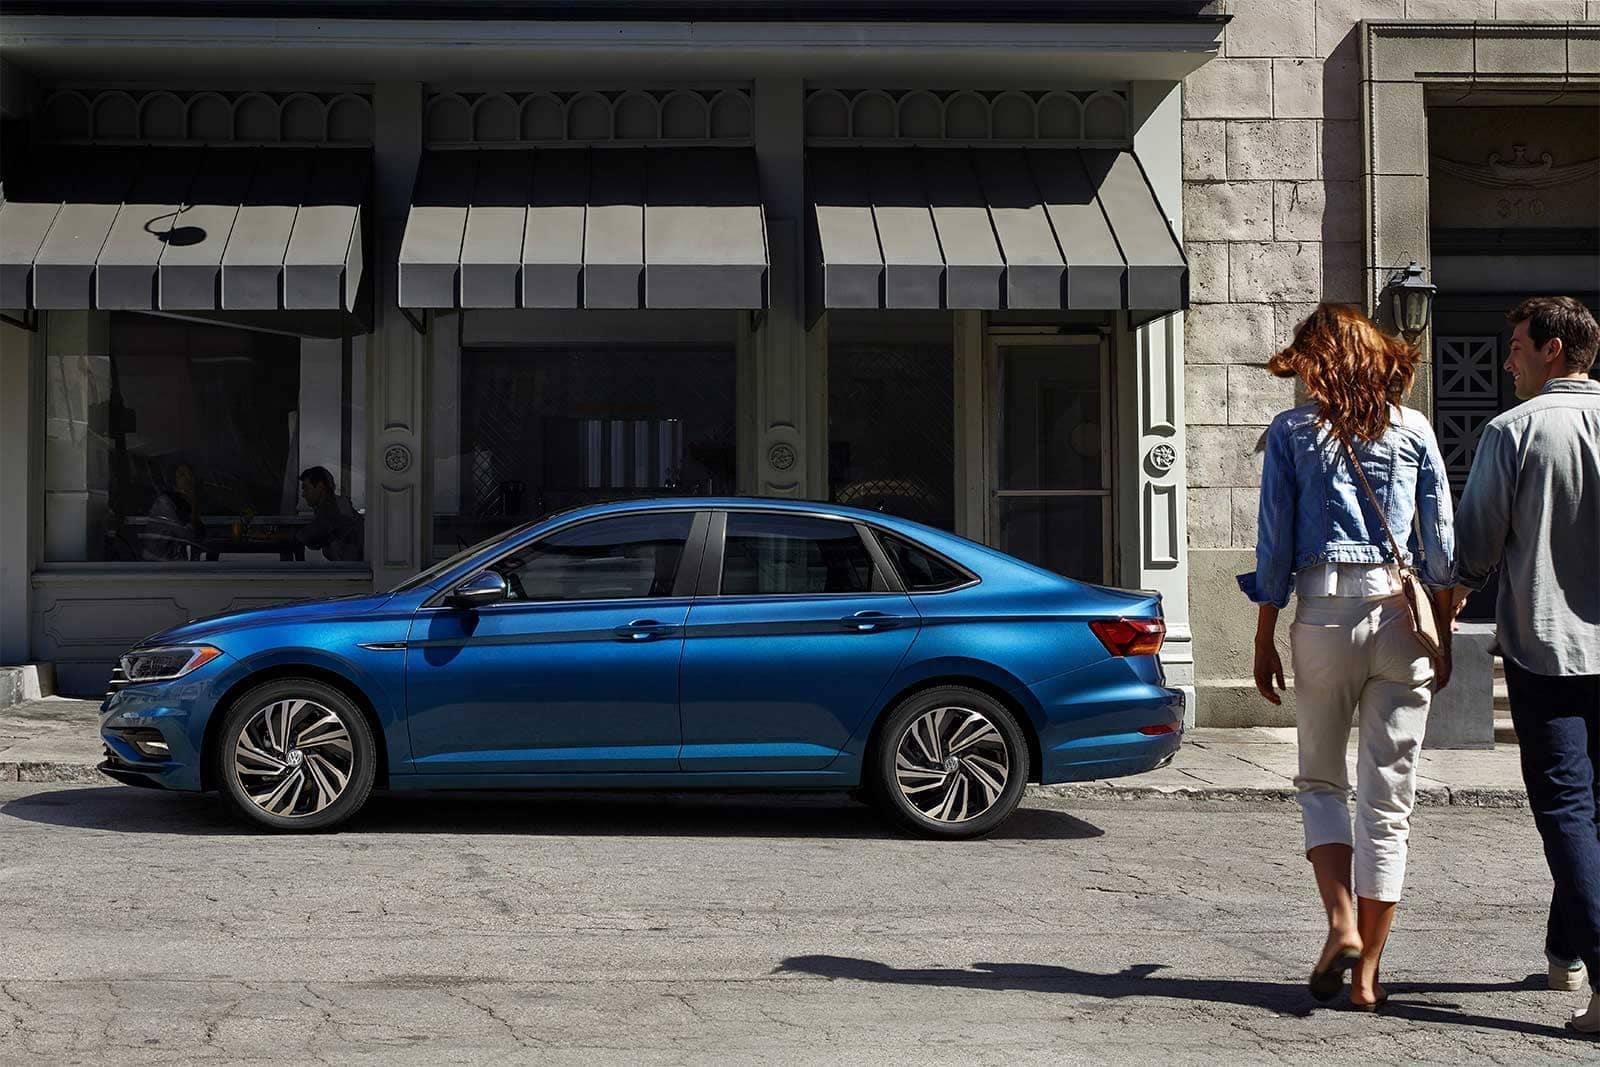 2019-Volkswagen-Jetta-SEL-Premium-in-silk-blue-metallic-side-view